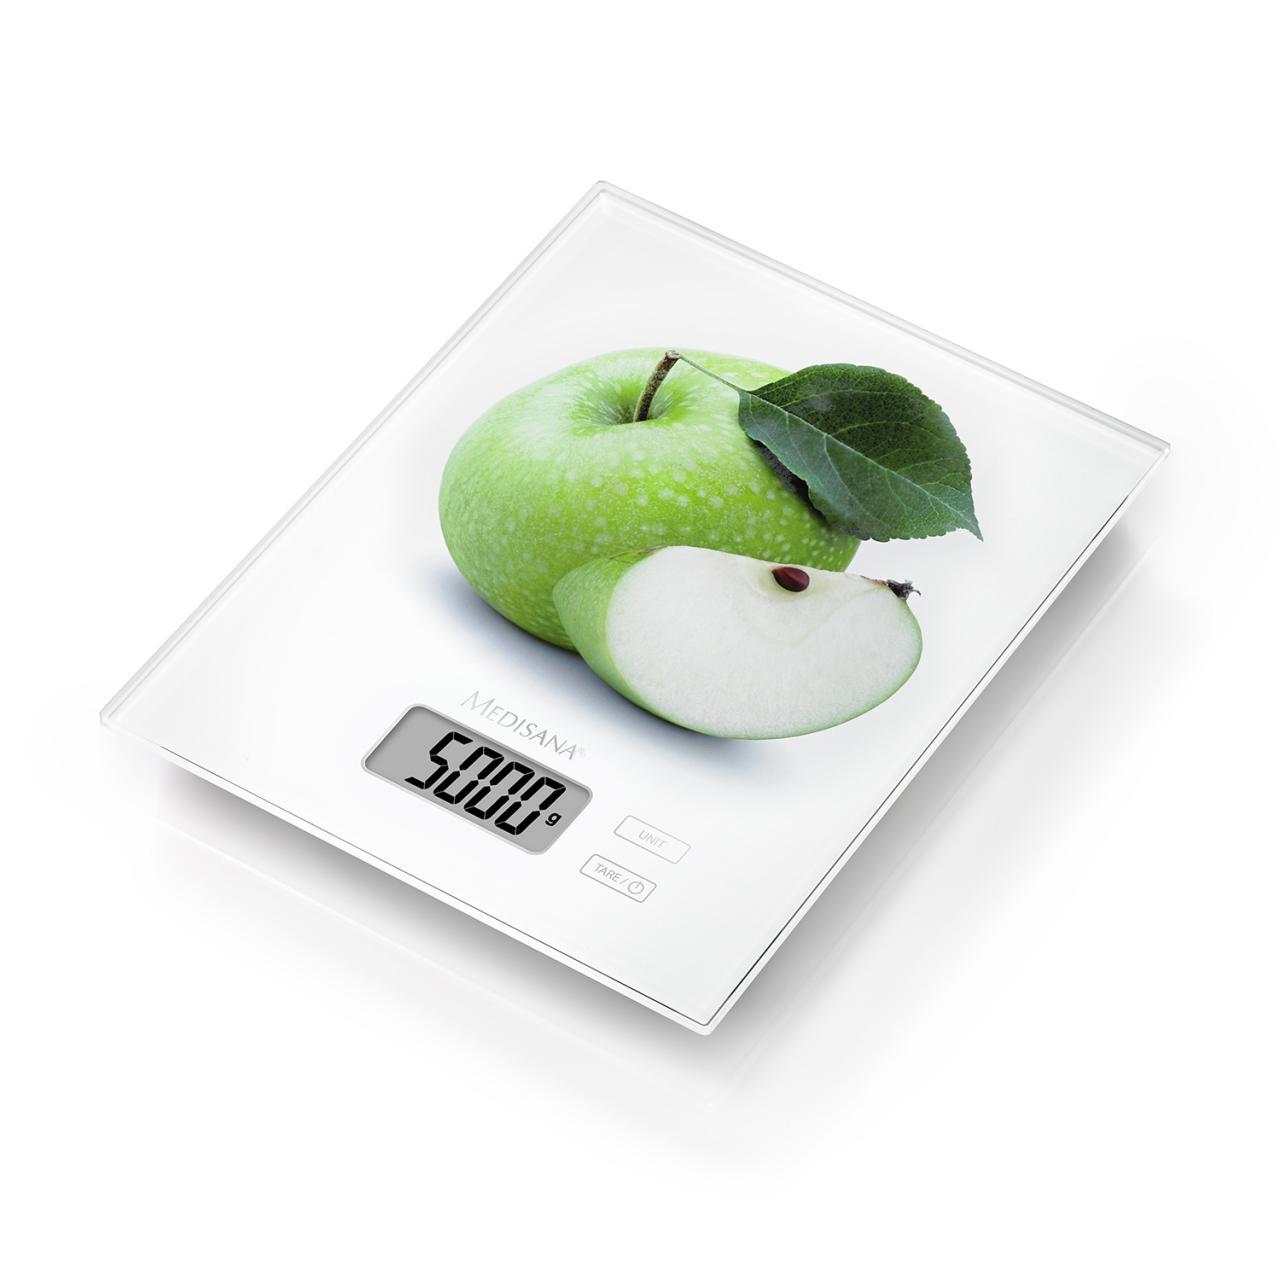 Cantar digital de bucatarie Medisana KS 210 40471 cu model mar, Ecran LCD, Picioare anti-alunecare, Indicator supraincarcare, 1-5kg, Alb